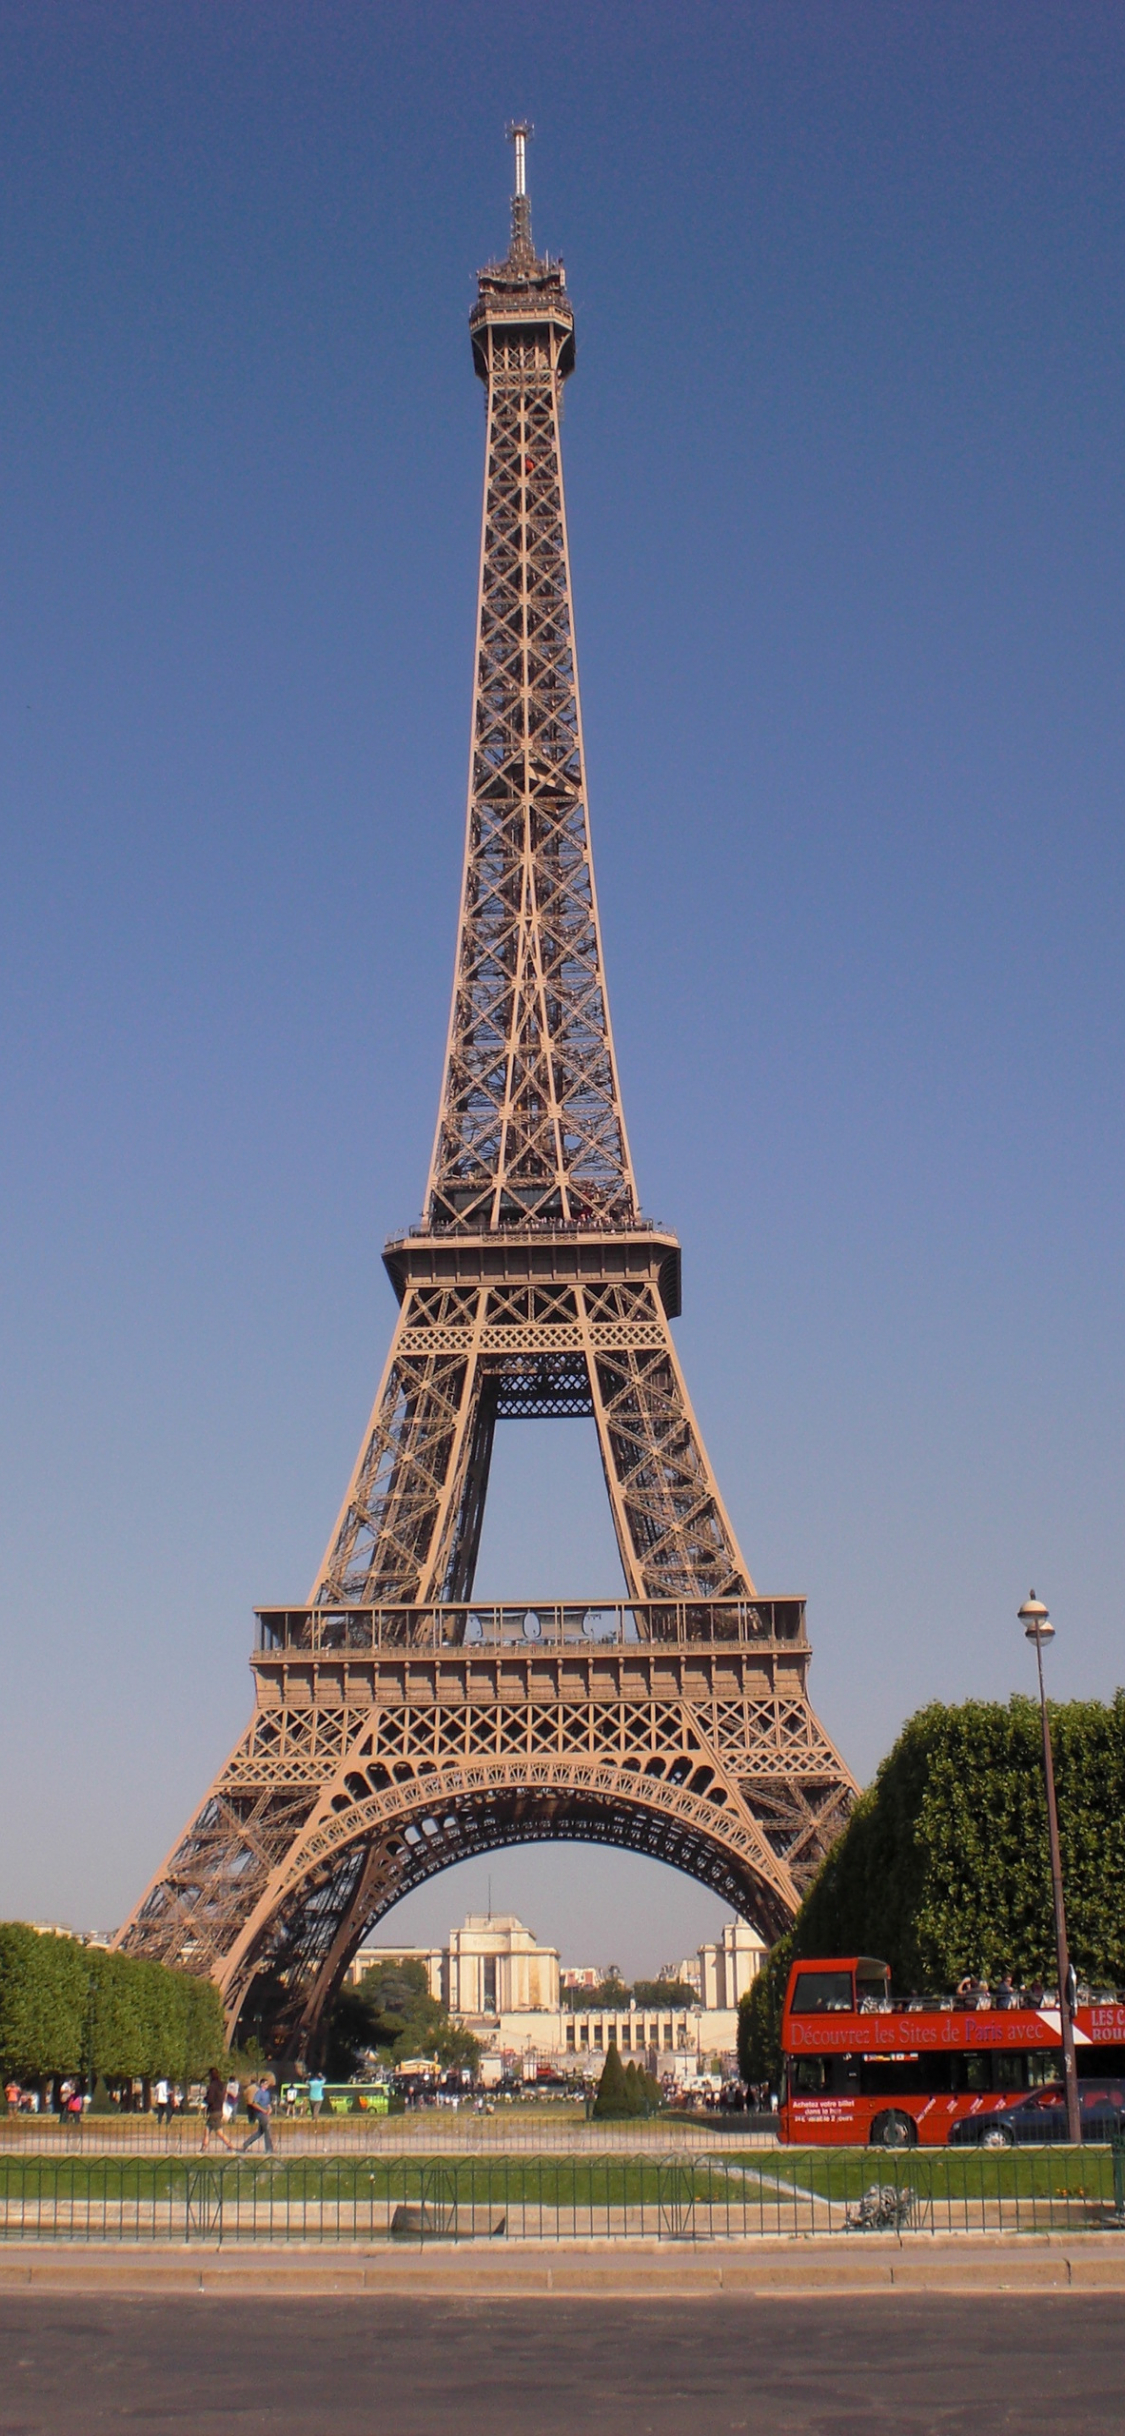 Free Download Paris Images The Eiffel Tower Hd Wallpaper And Background Photos 1920x2560 For Your Desktop Mobile Tablet Explore 30 Paris France Eiffel Tower Wallpapers Eiffel Tower Paris France